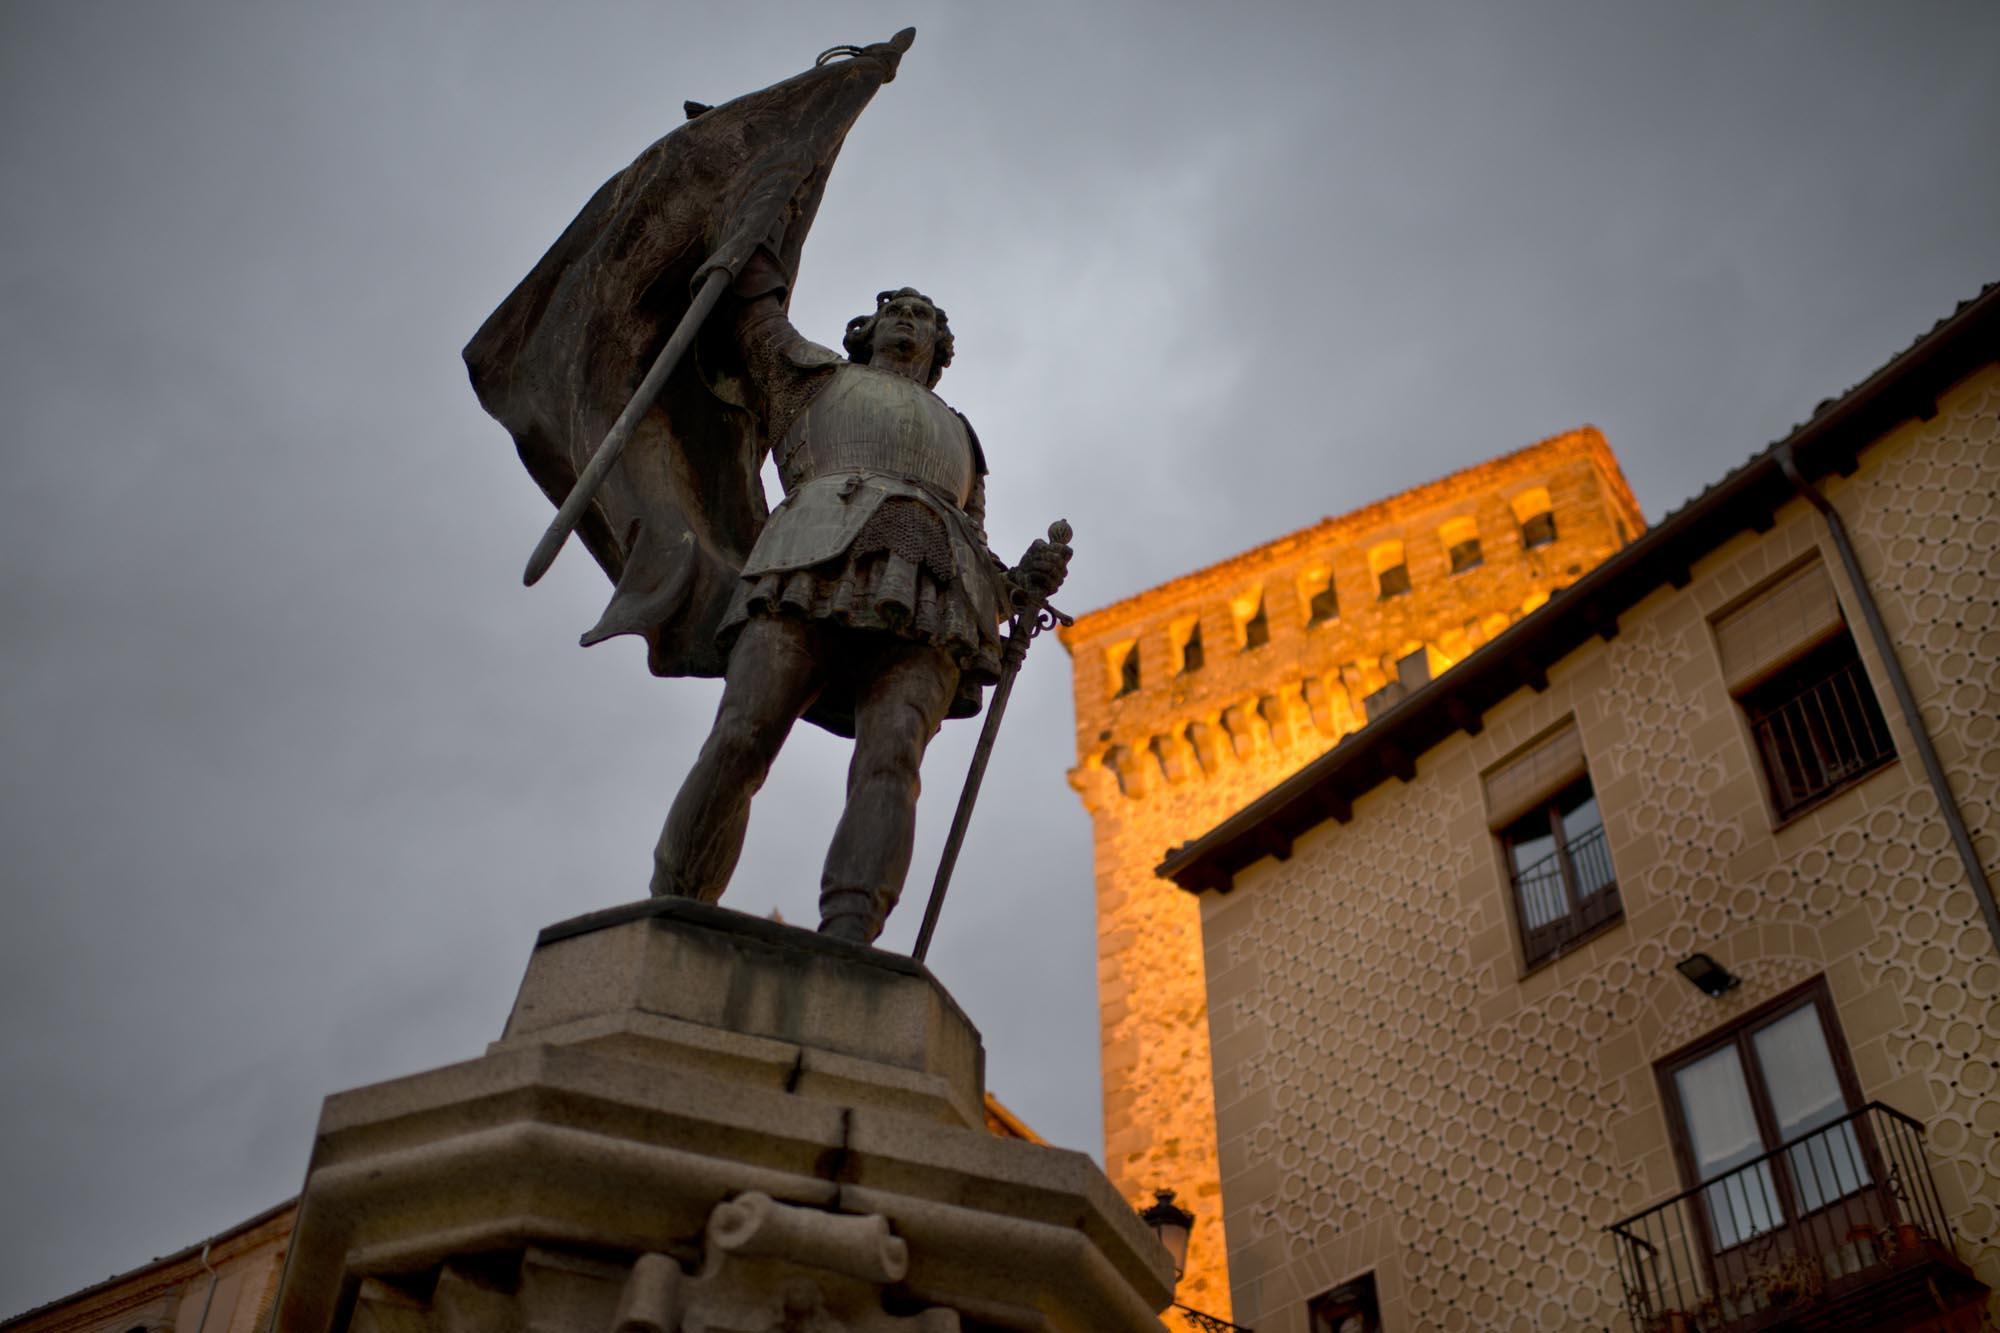 Detalle de la estatua que preside la Plaza de las Sirenas.